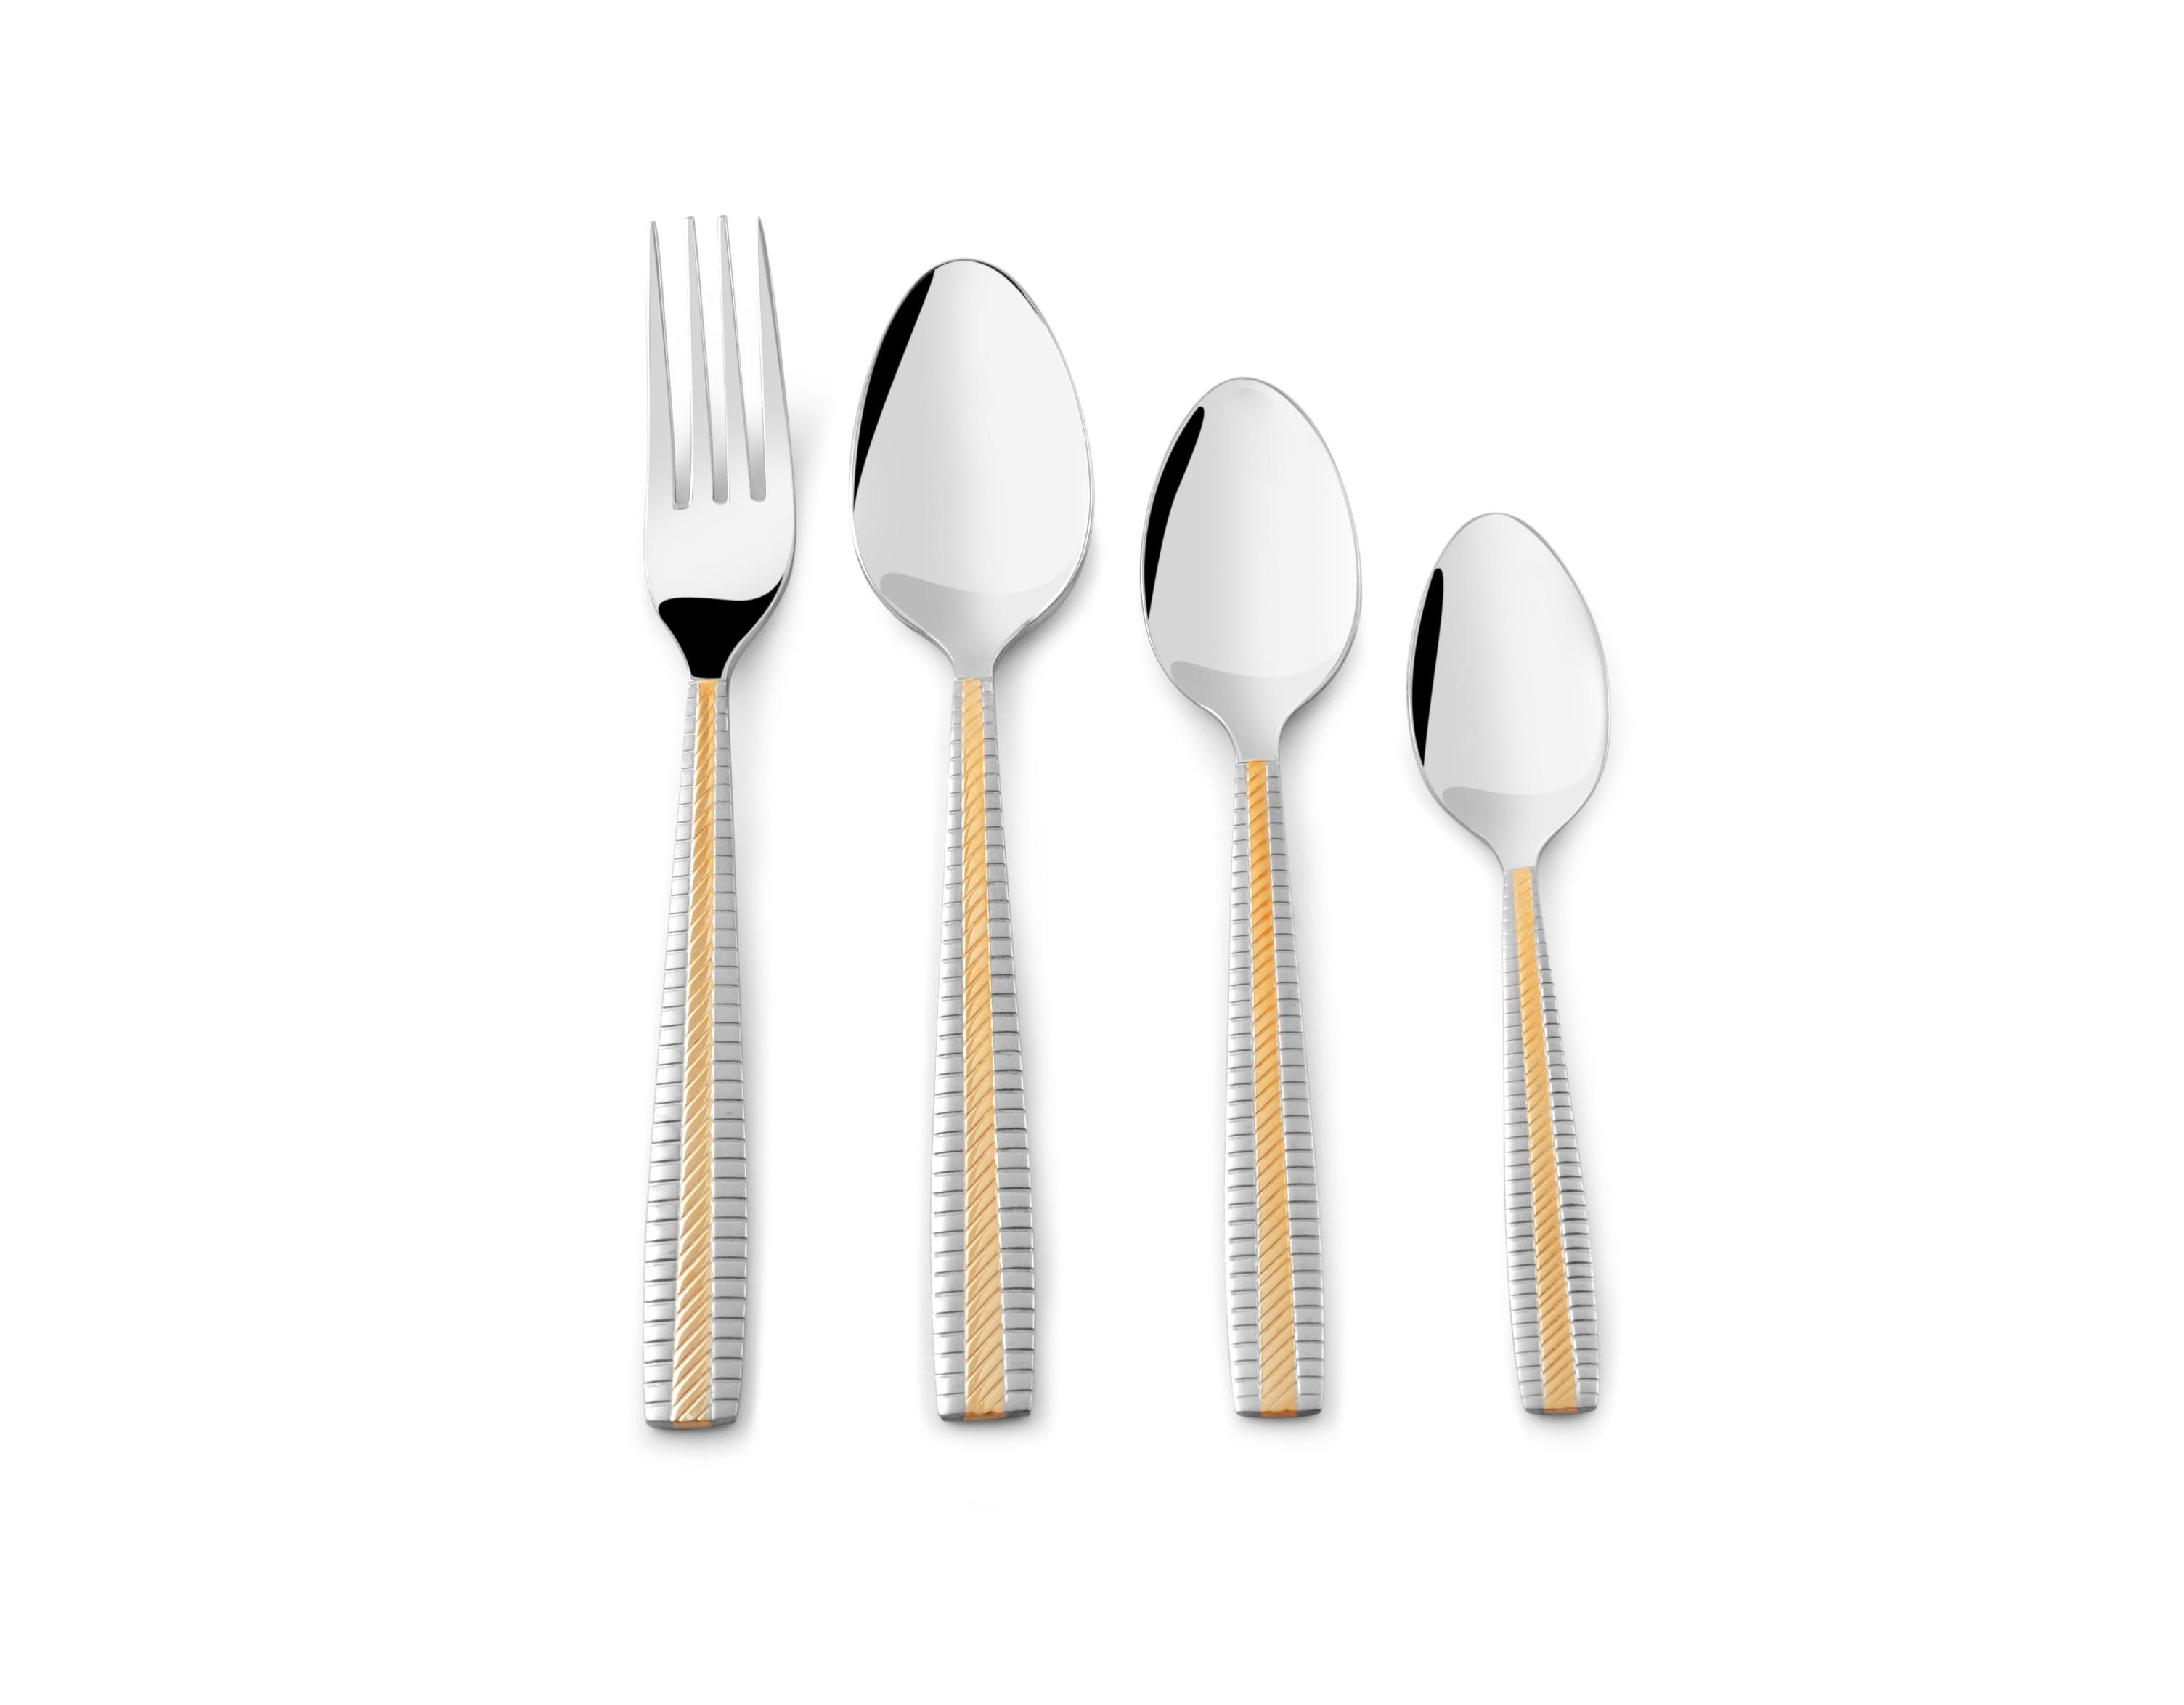 24pc Stylish Kitchen Stainless Steel Cutlery Set Tableware Dining utensils